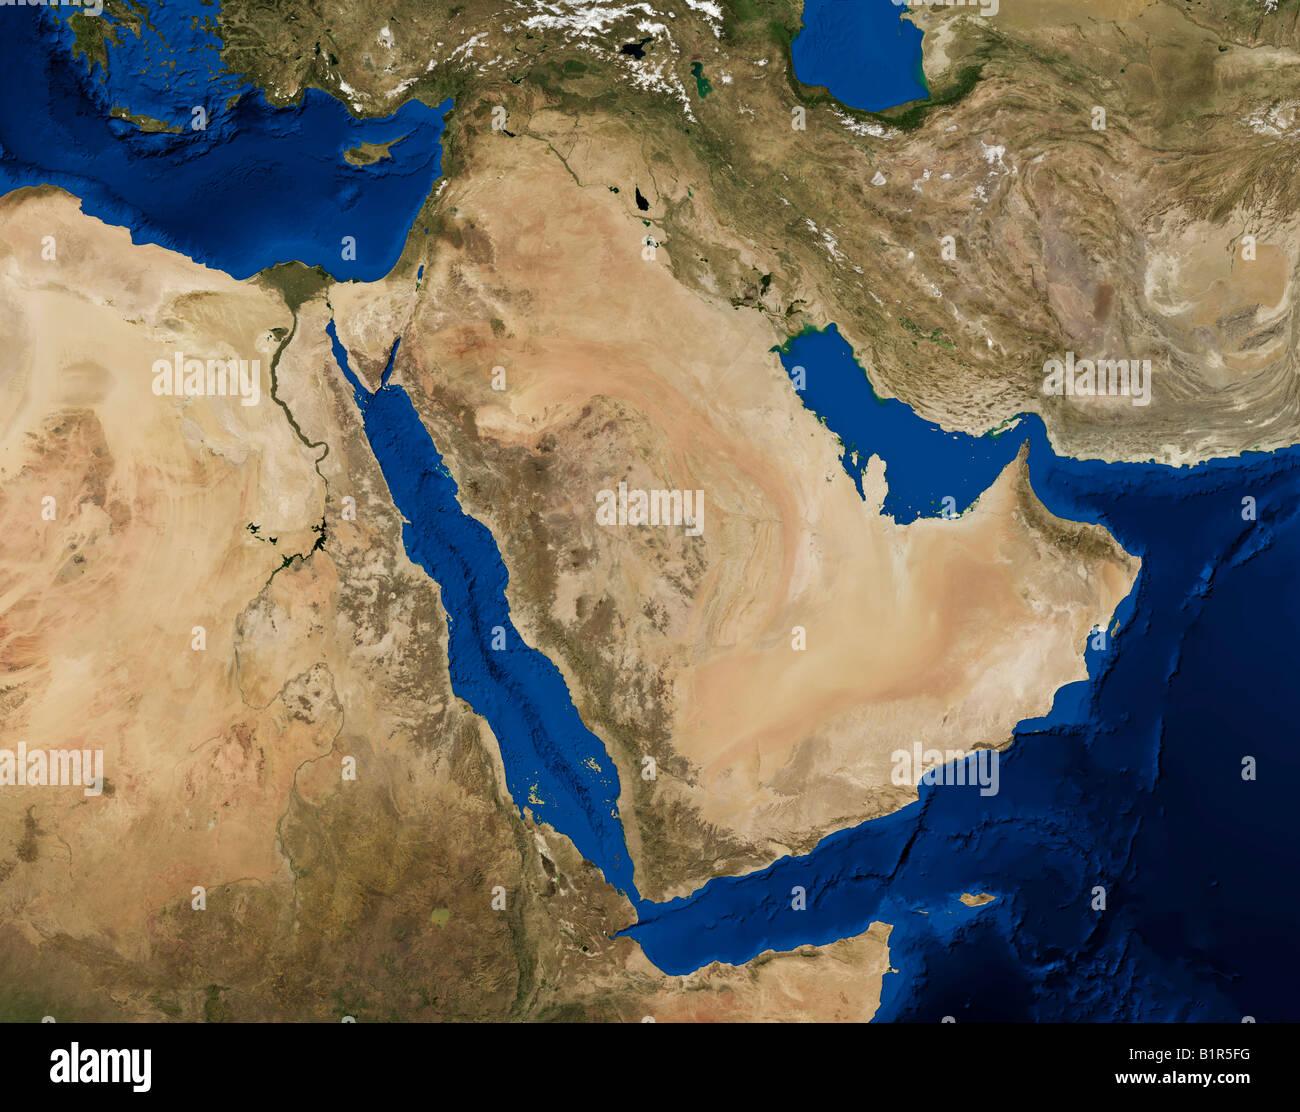 True Color Terra Modis Satellite Image Of The Arabian